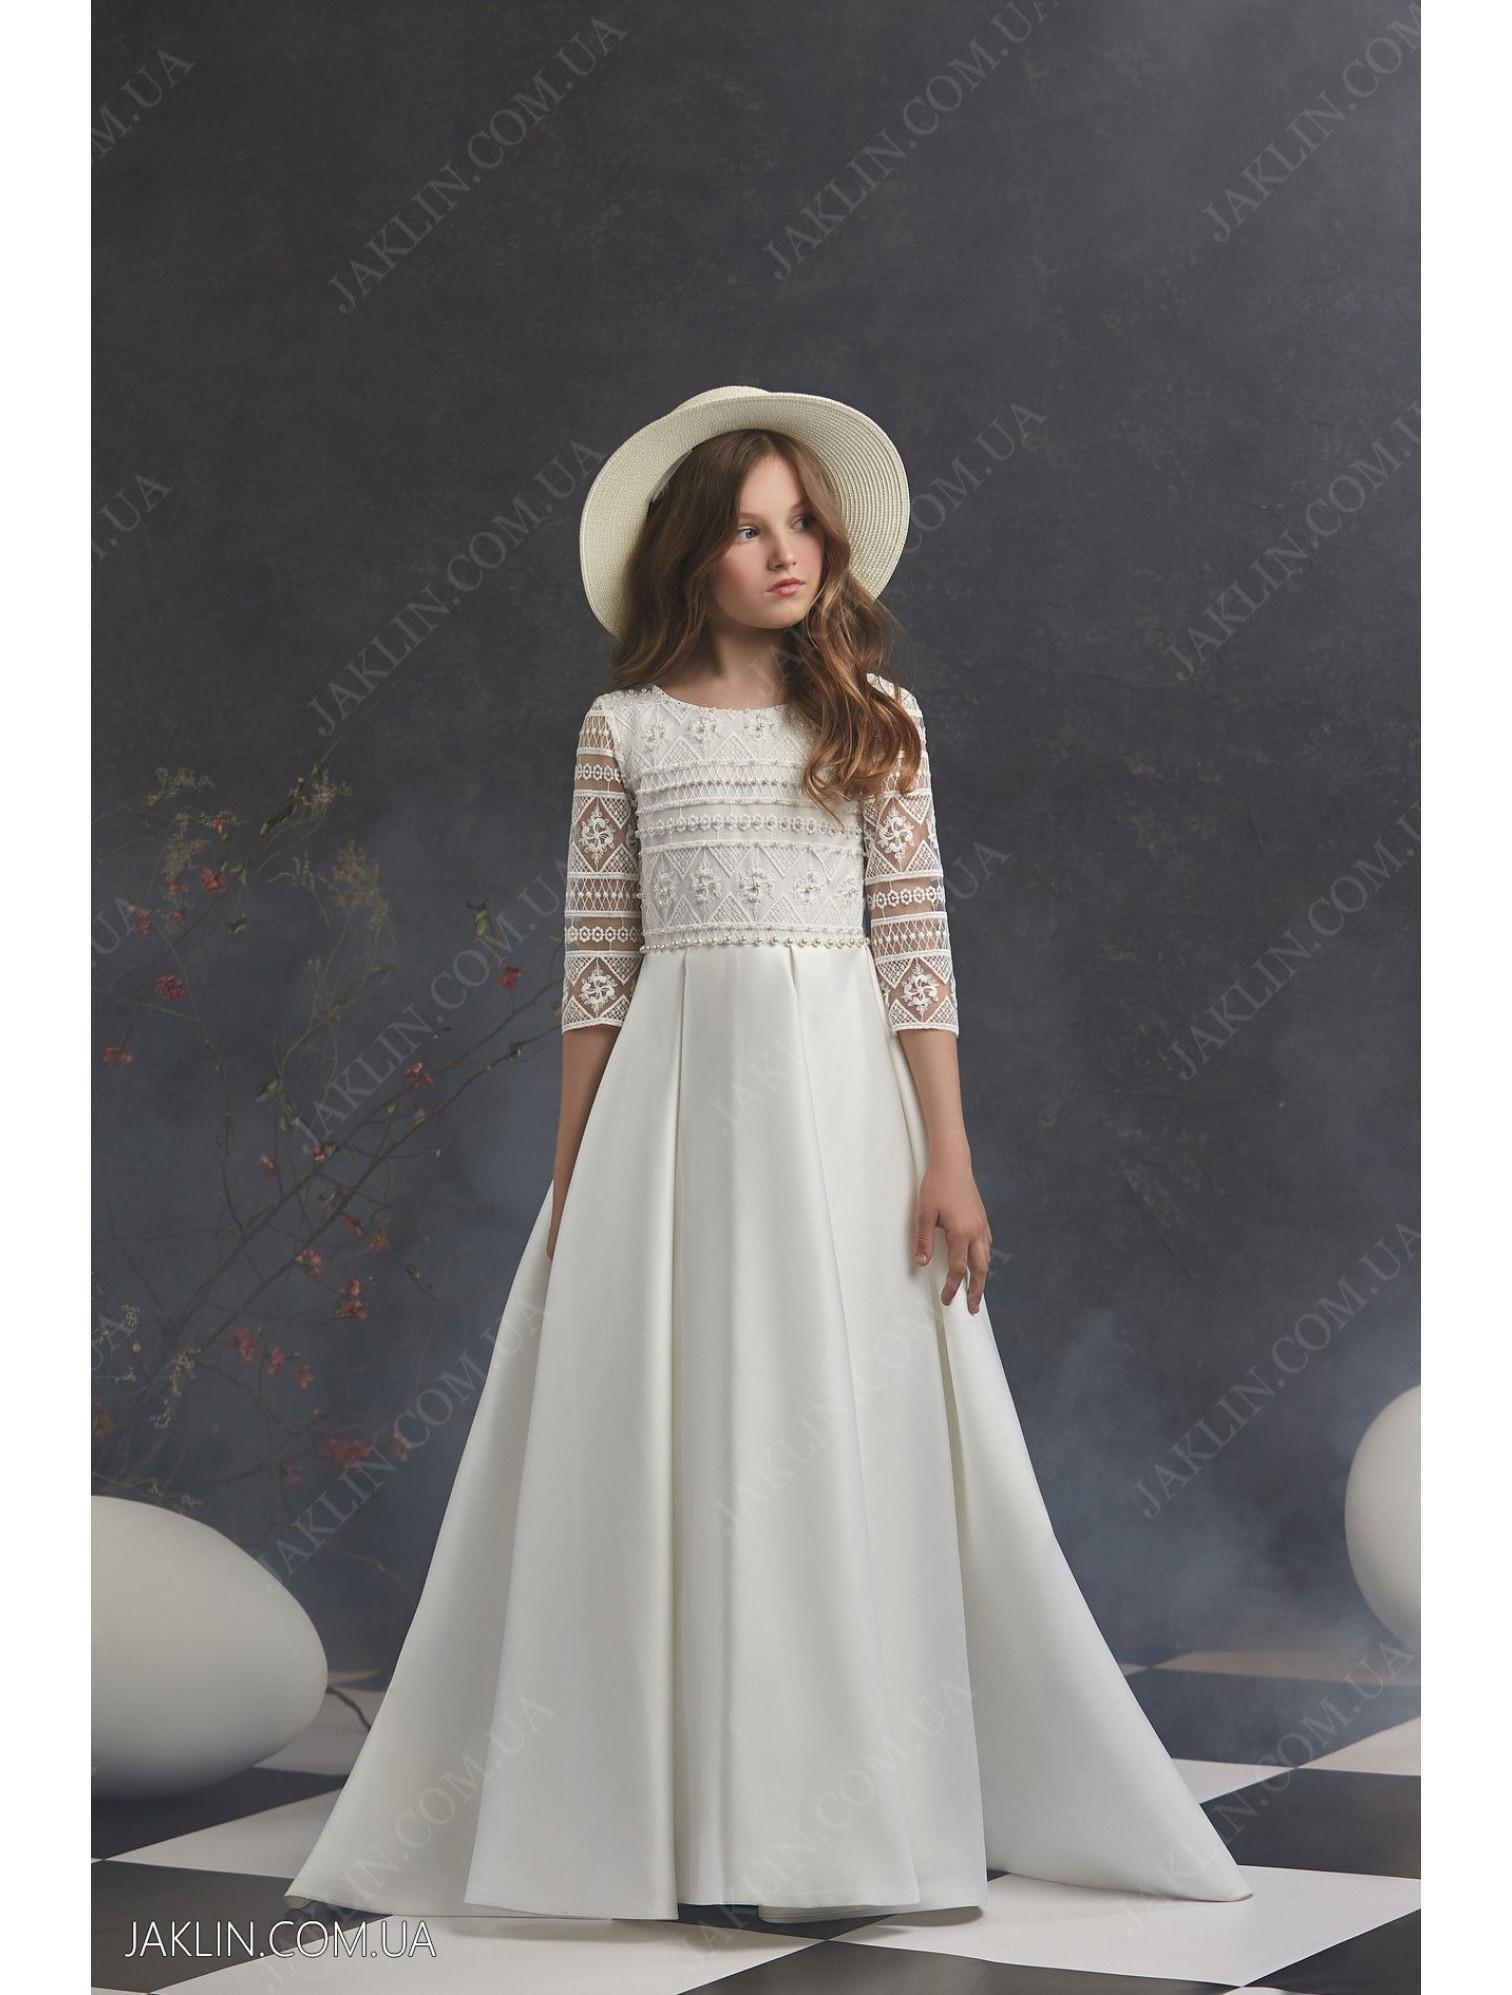 Child dress 3032